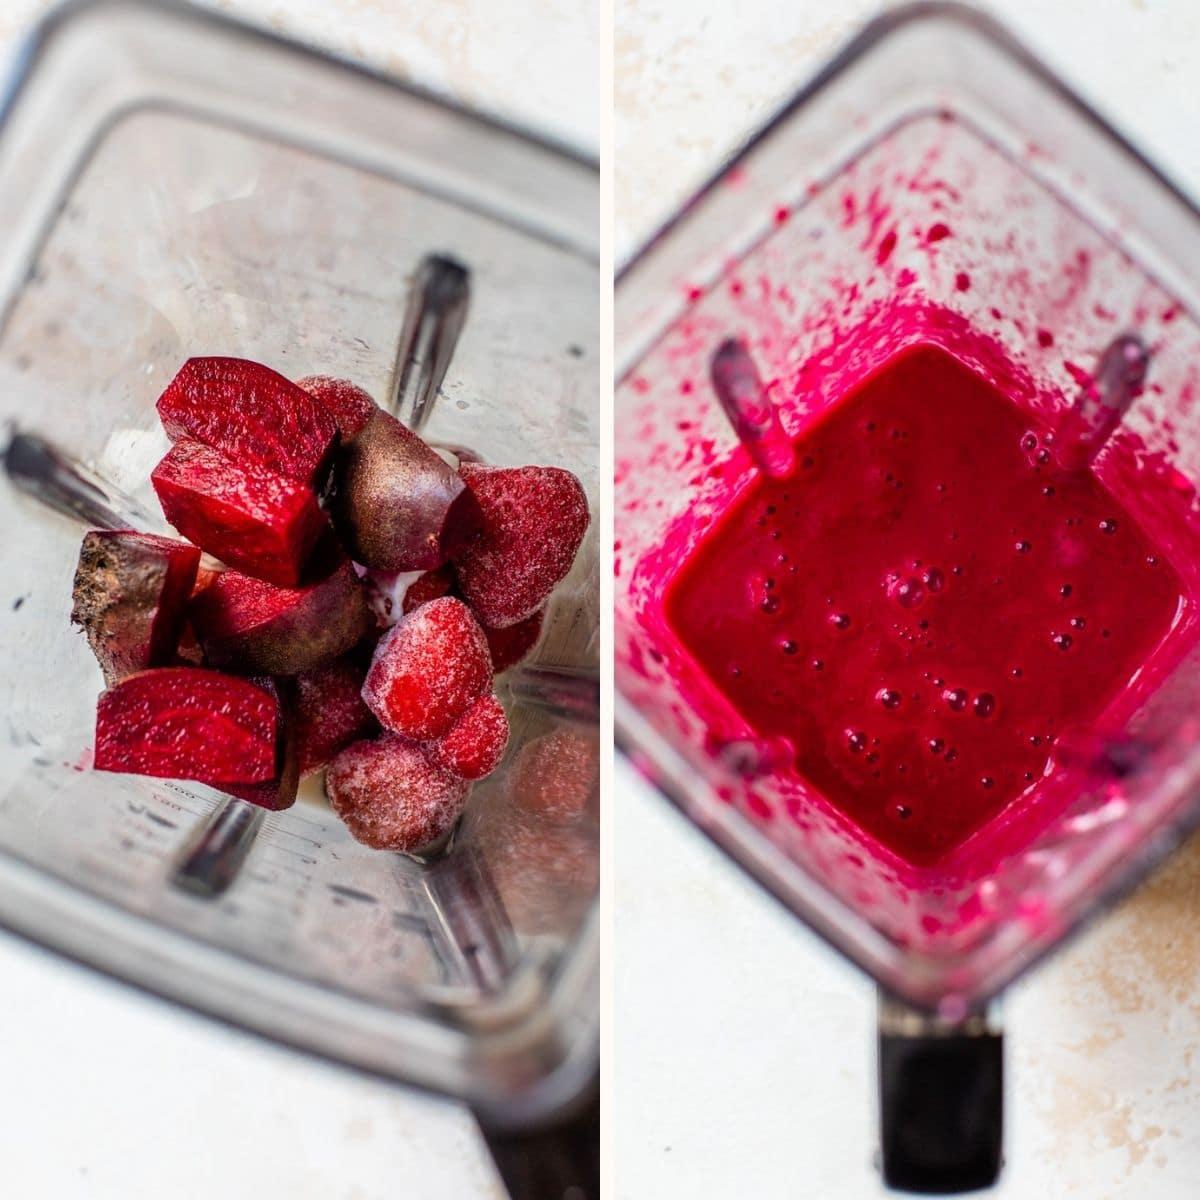 hot pink smoothie in a blender